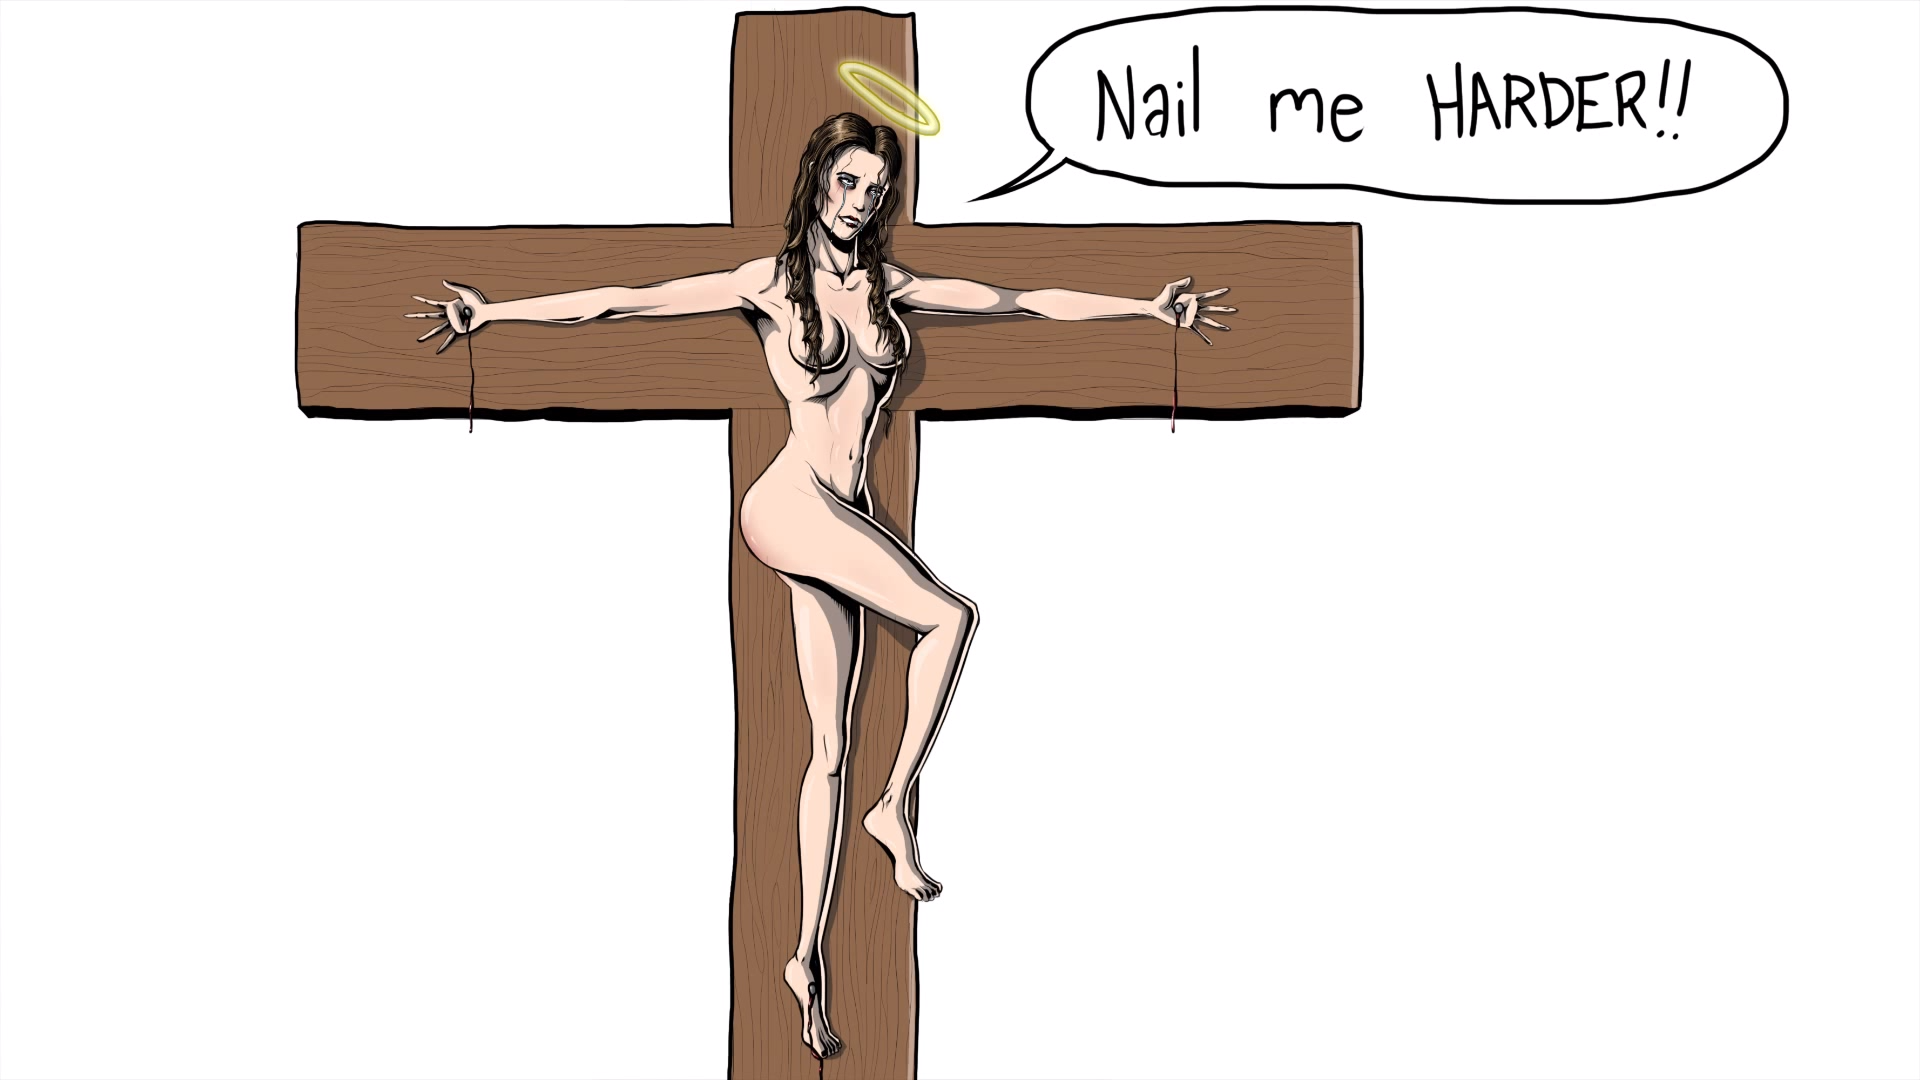 Some christians say dc's new jesus christ superhero is blasphemous